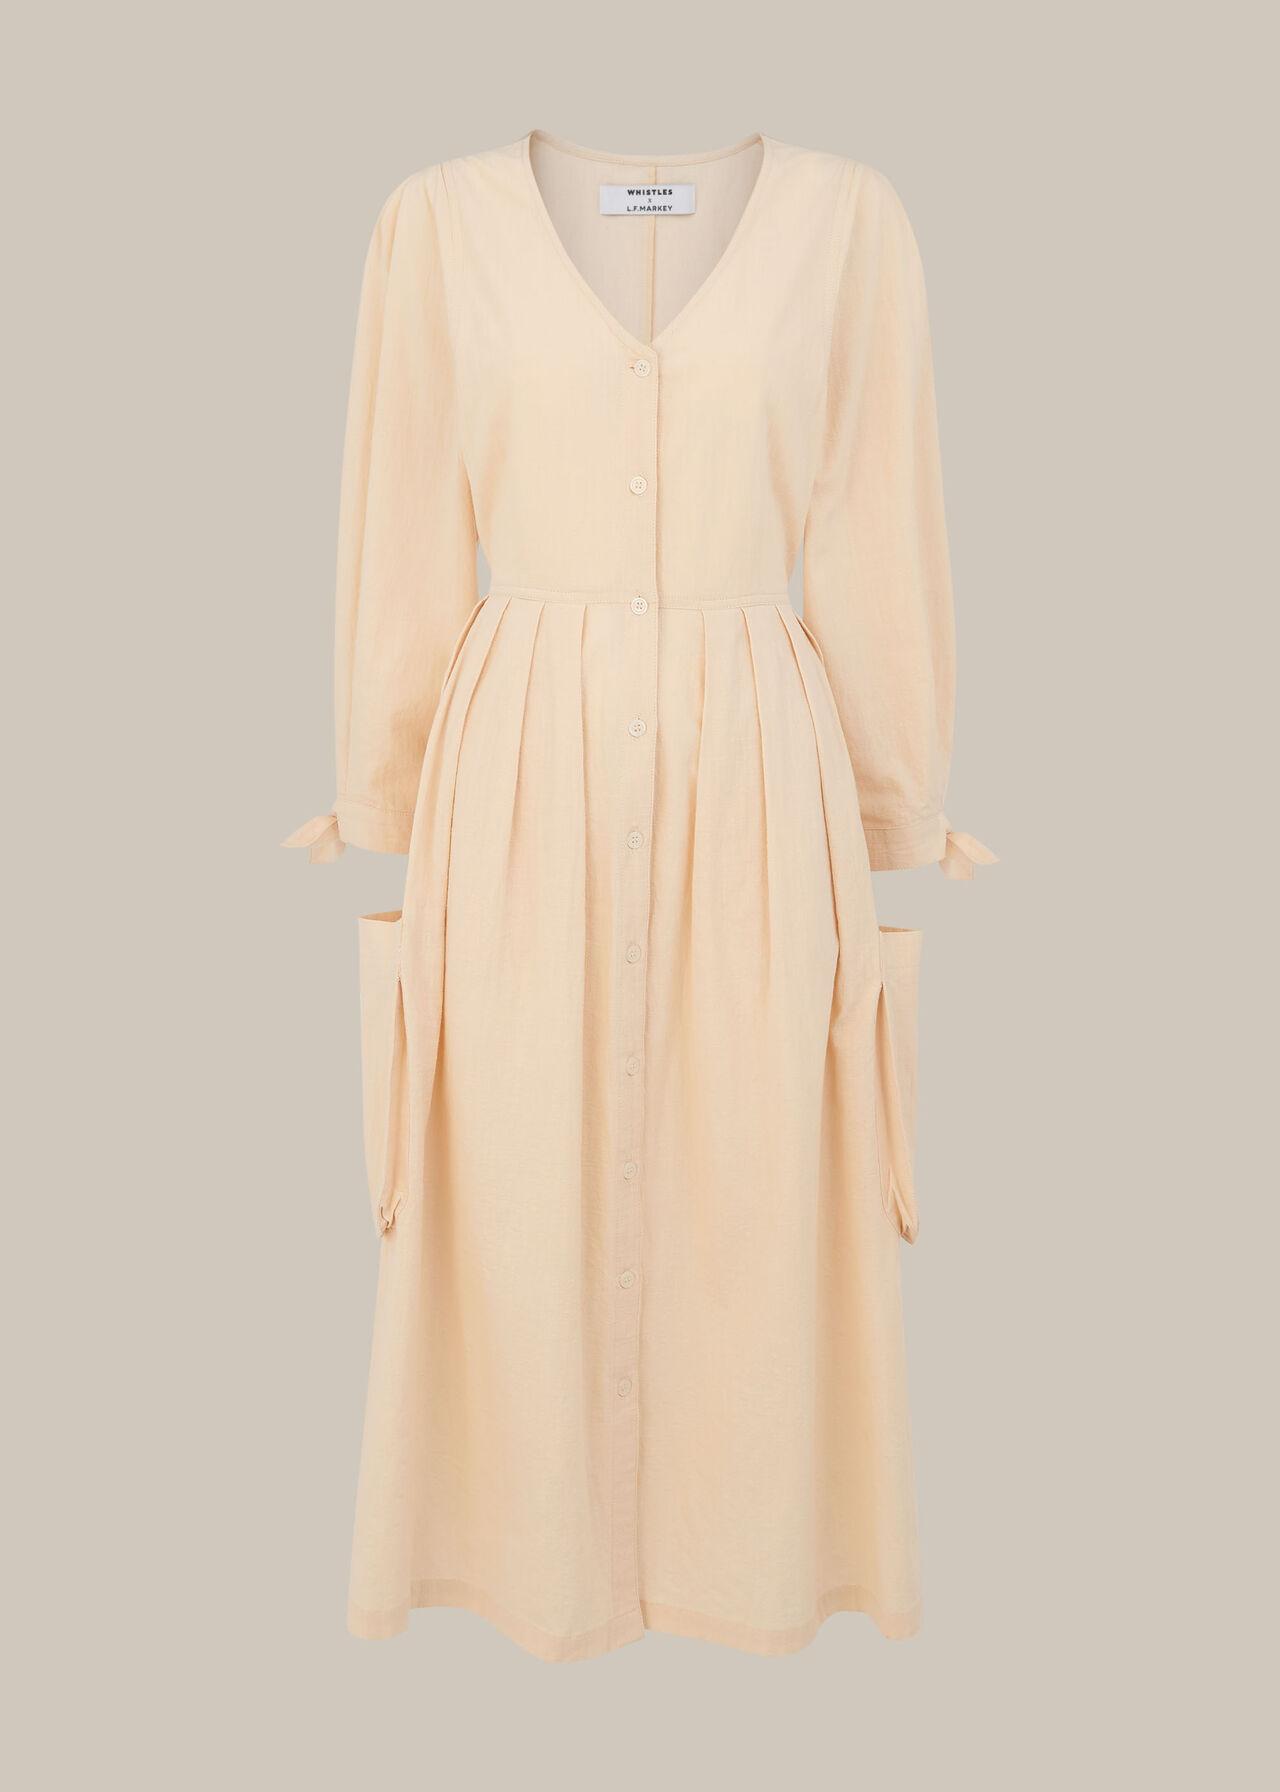 LF Markey Orlando Dress